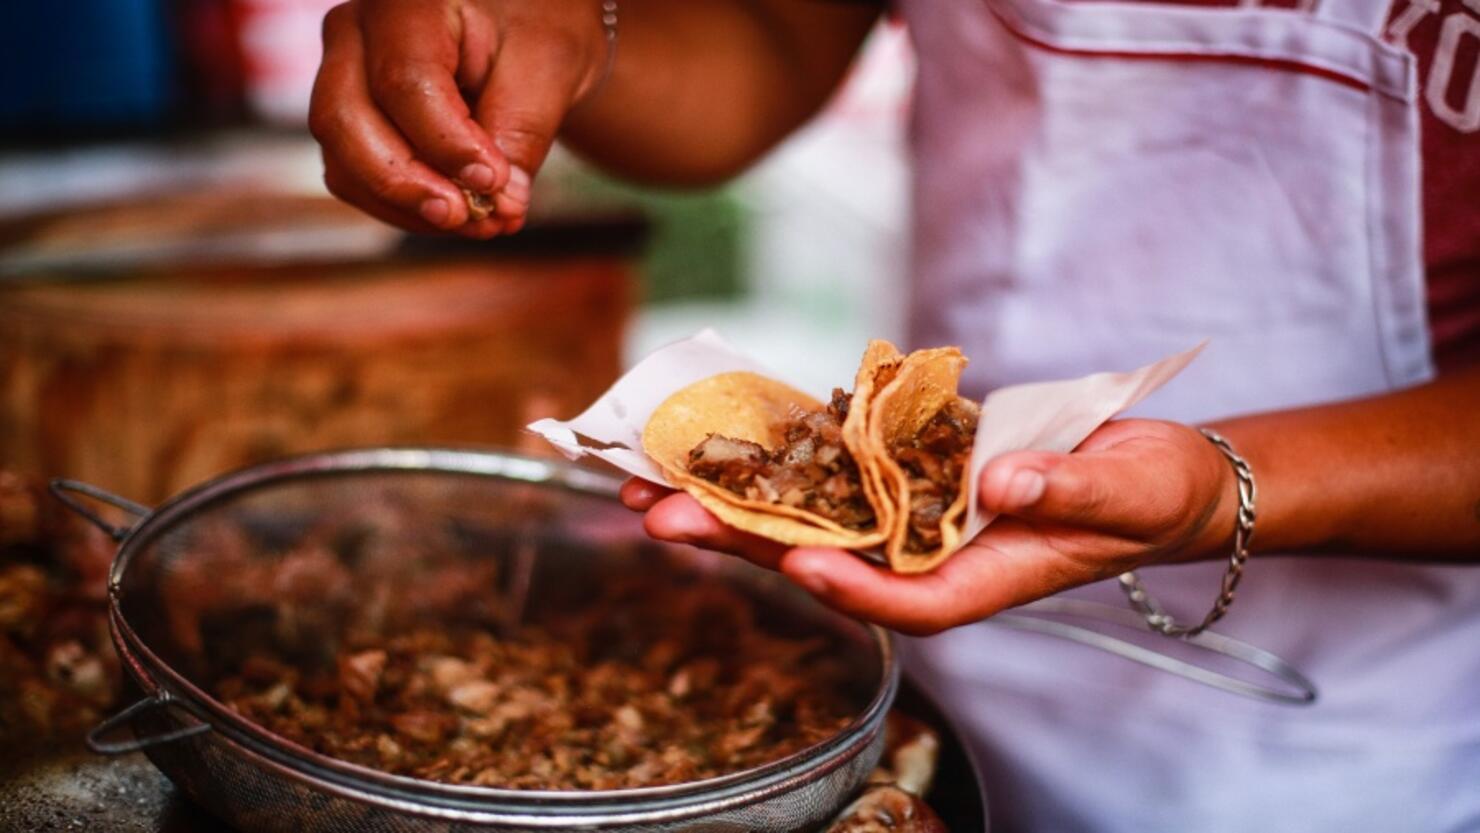 Street Food Business Hit By Coronavirus Effect